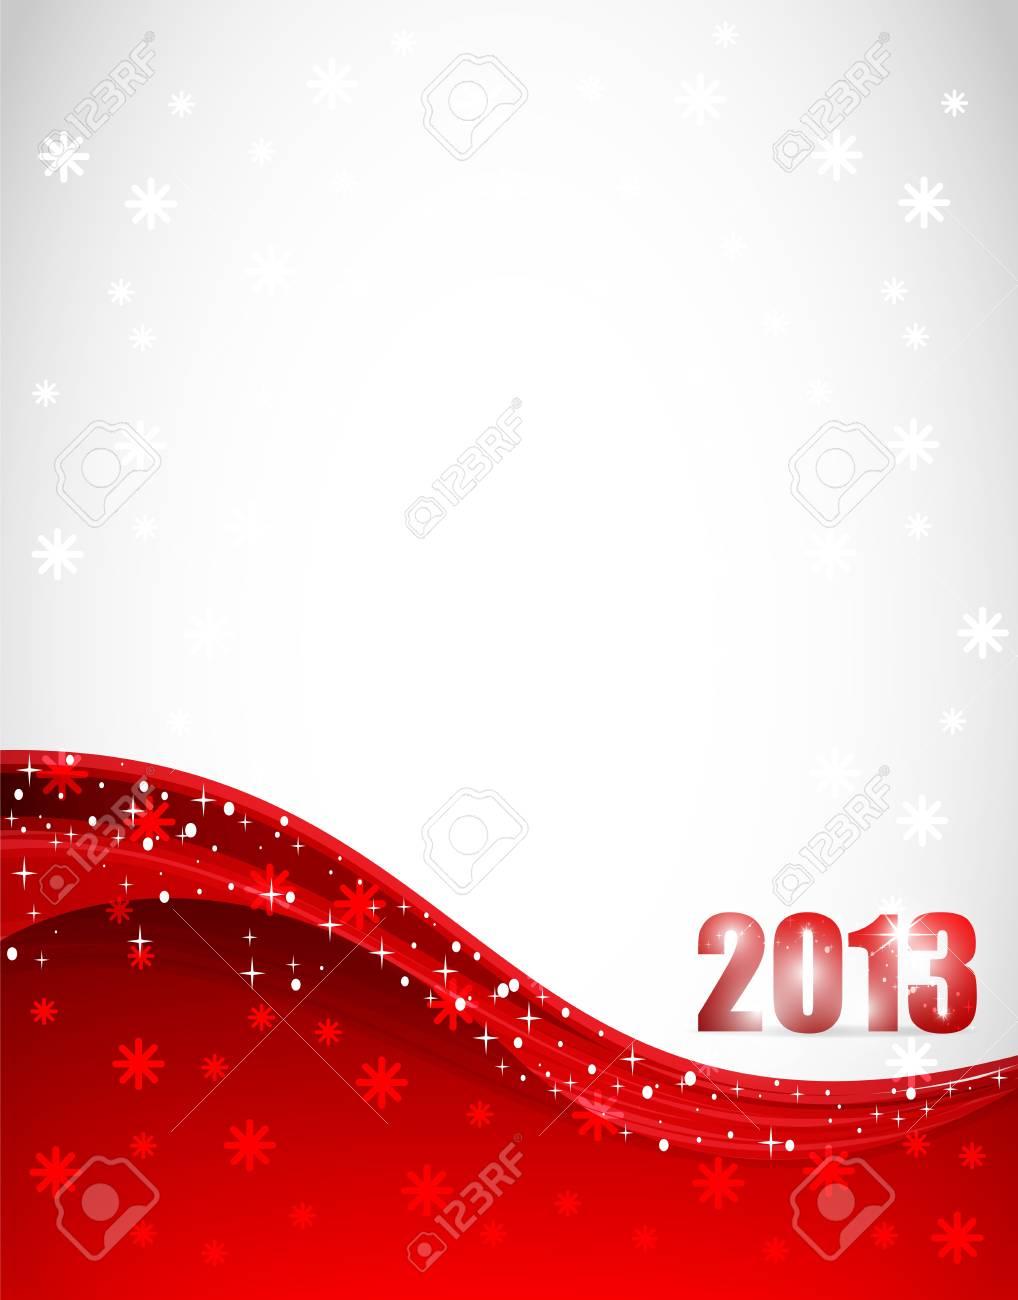 New Year 2013 Stock Vector - 12585671